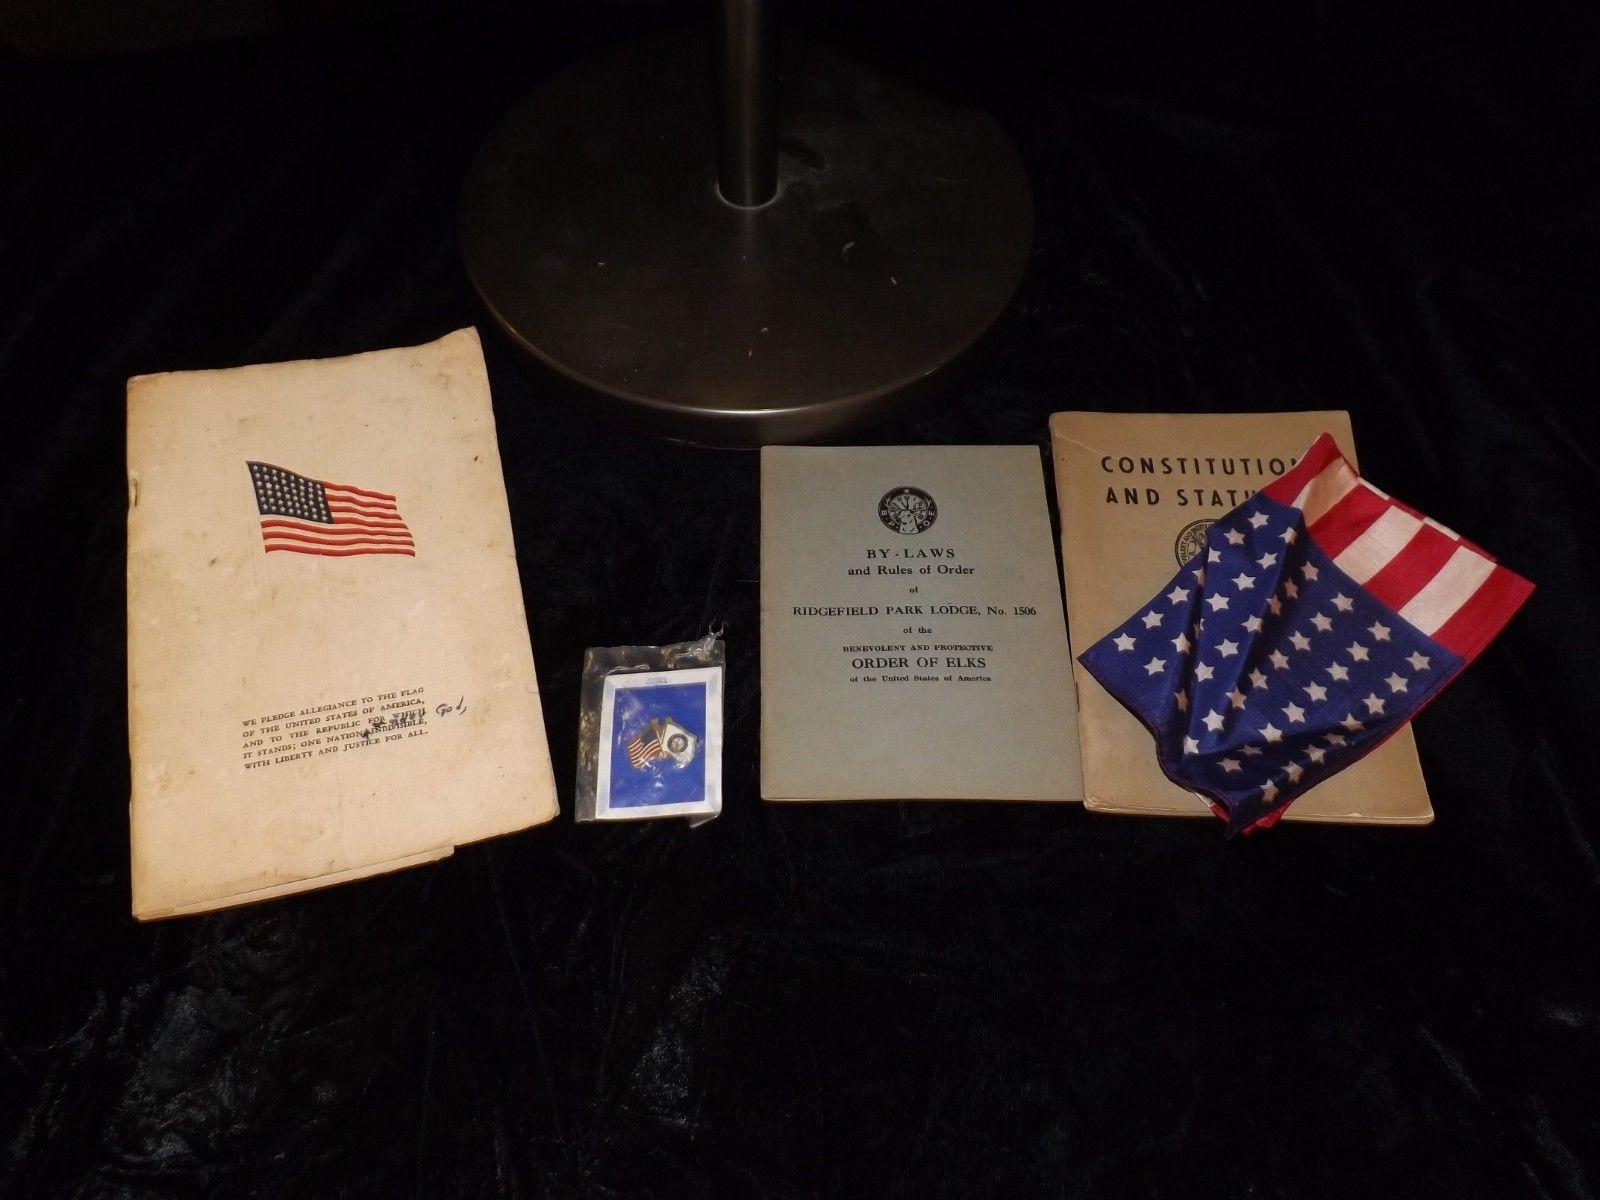 Vintage Order of Elks vest with pins, 1951/52 booklets flag and letter of accept